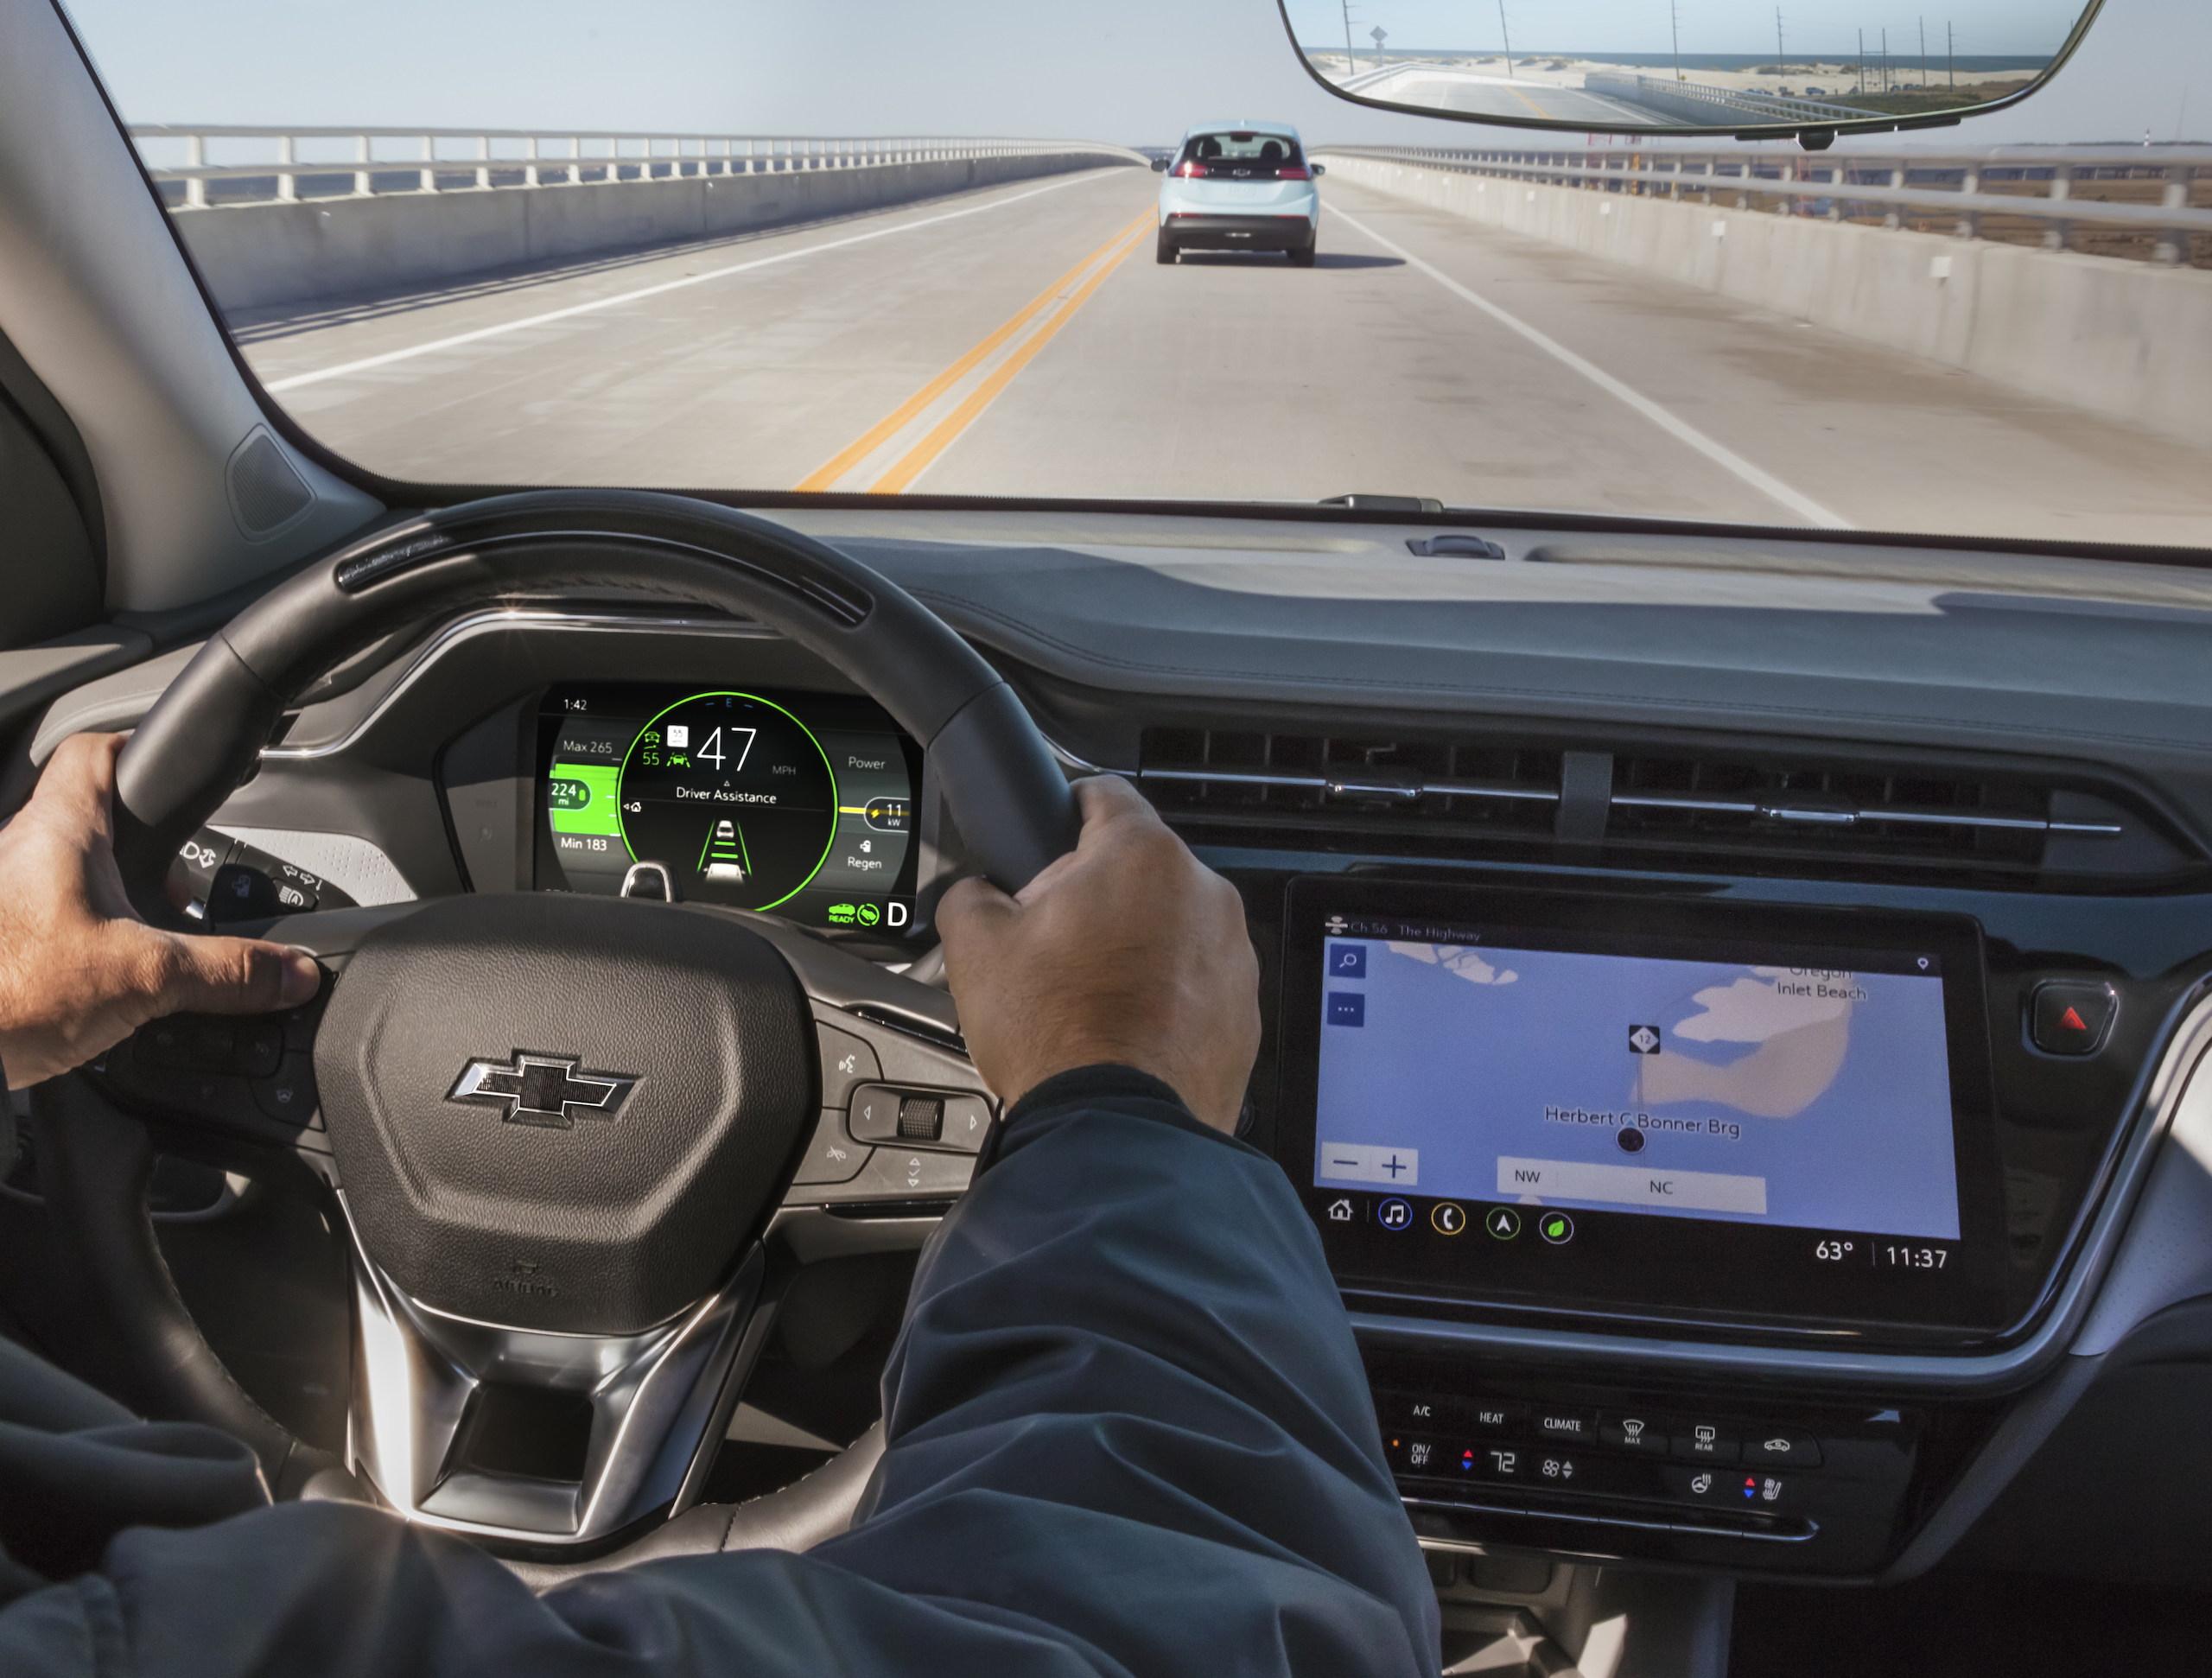 2022 Chevrolet Bolt EUV interior adaptive cruise on